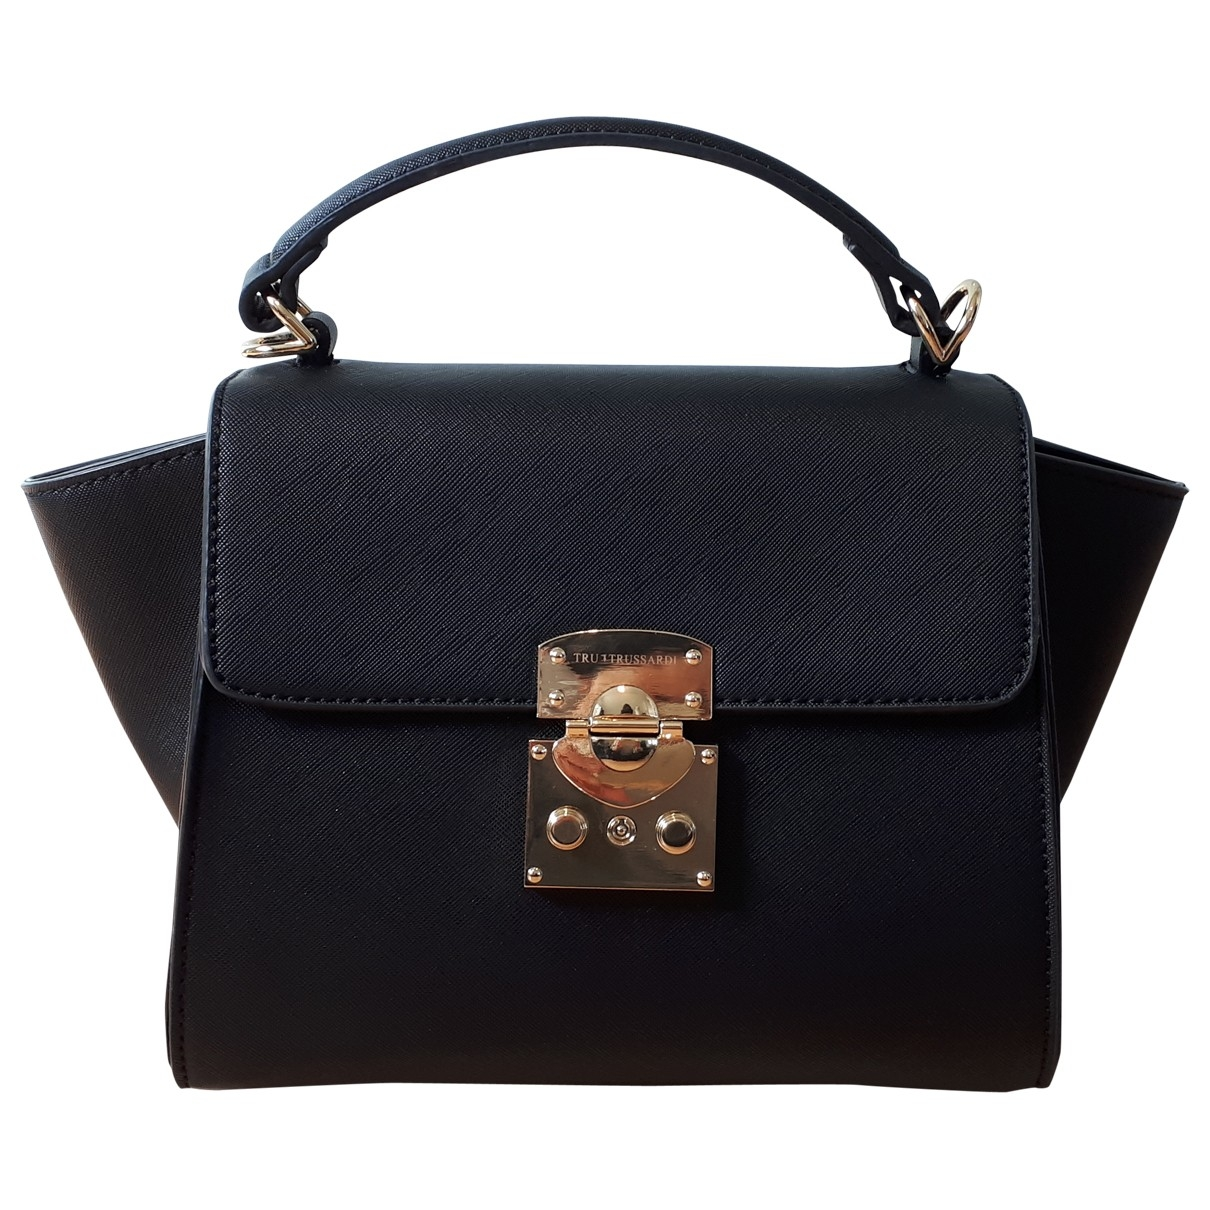 Trussardi \N Black Leather handbag for Women \N